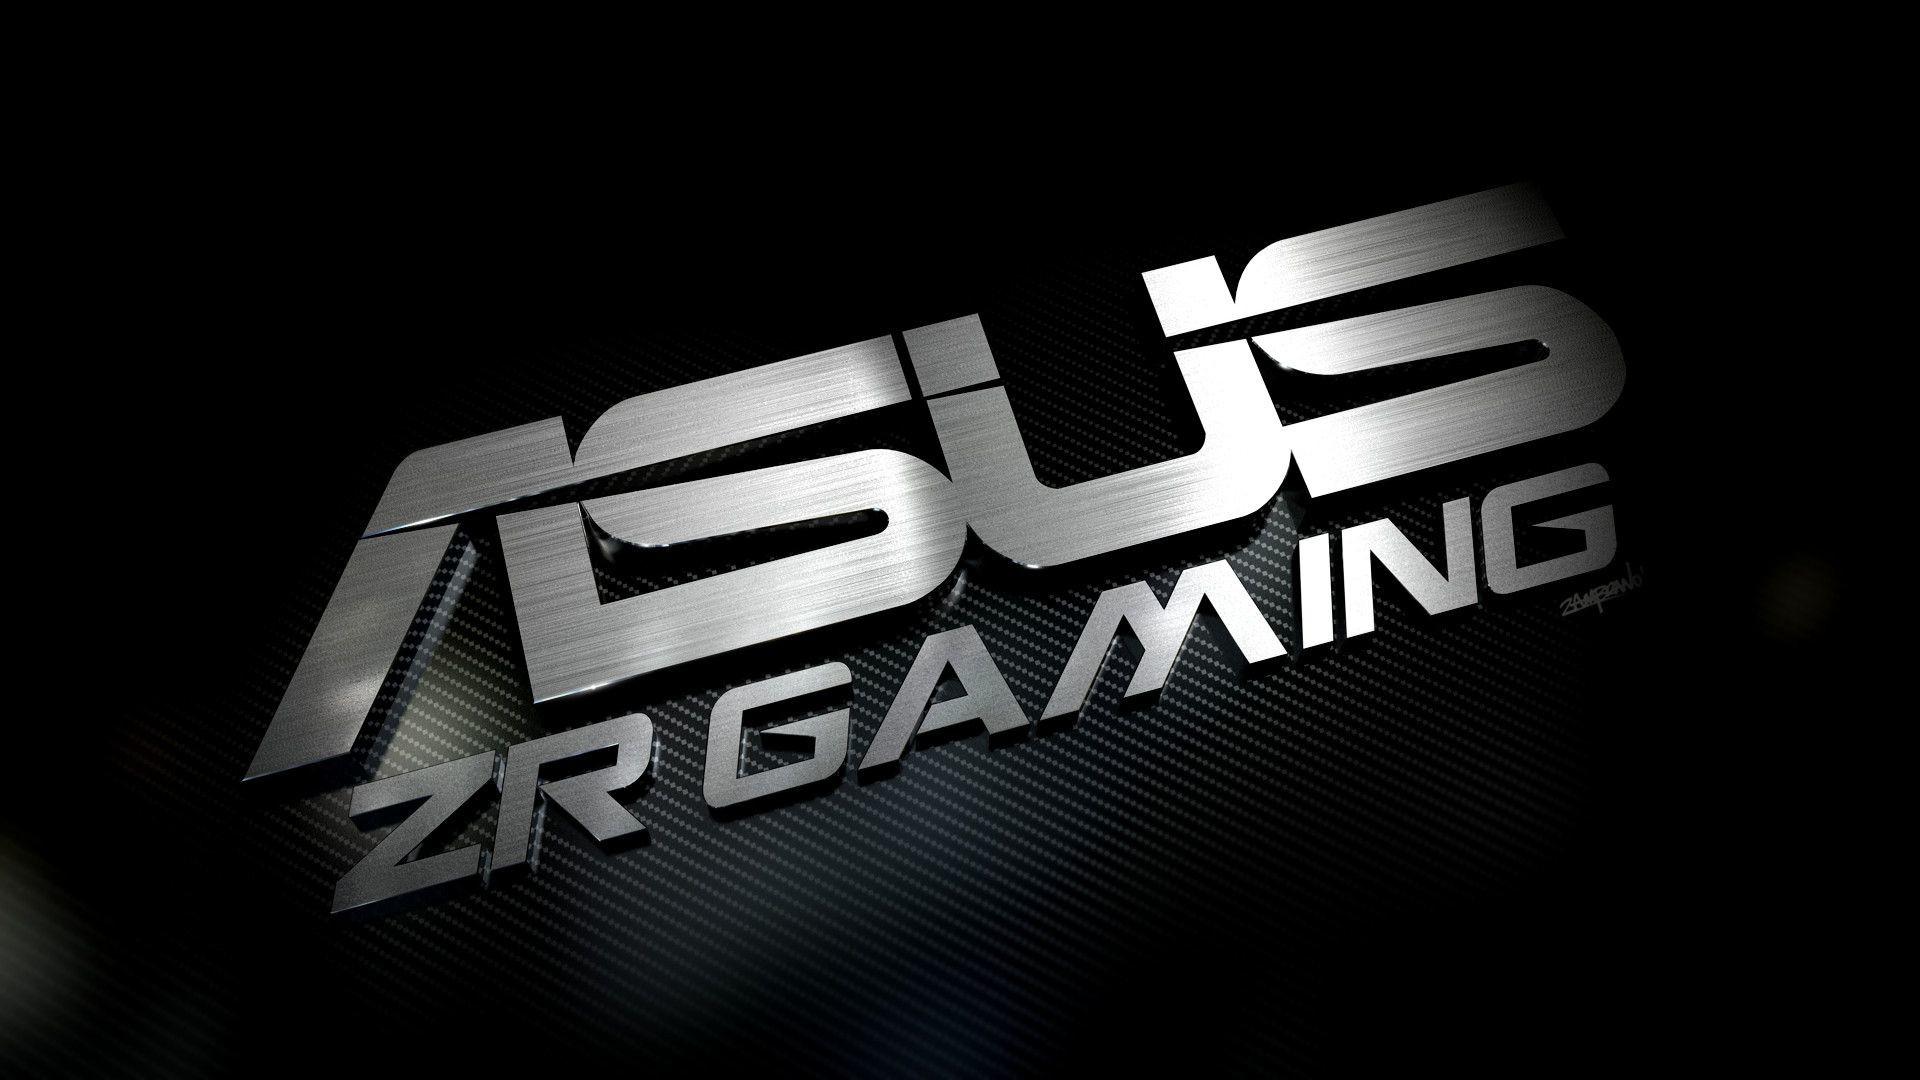 X Download Asus Zr Gaming Wallpaper